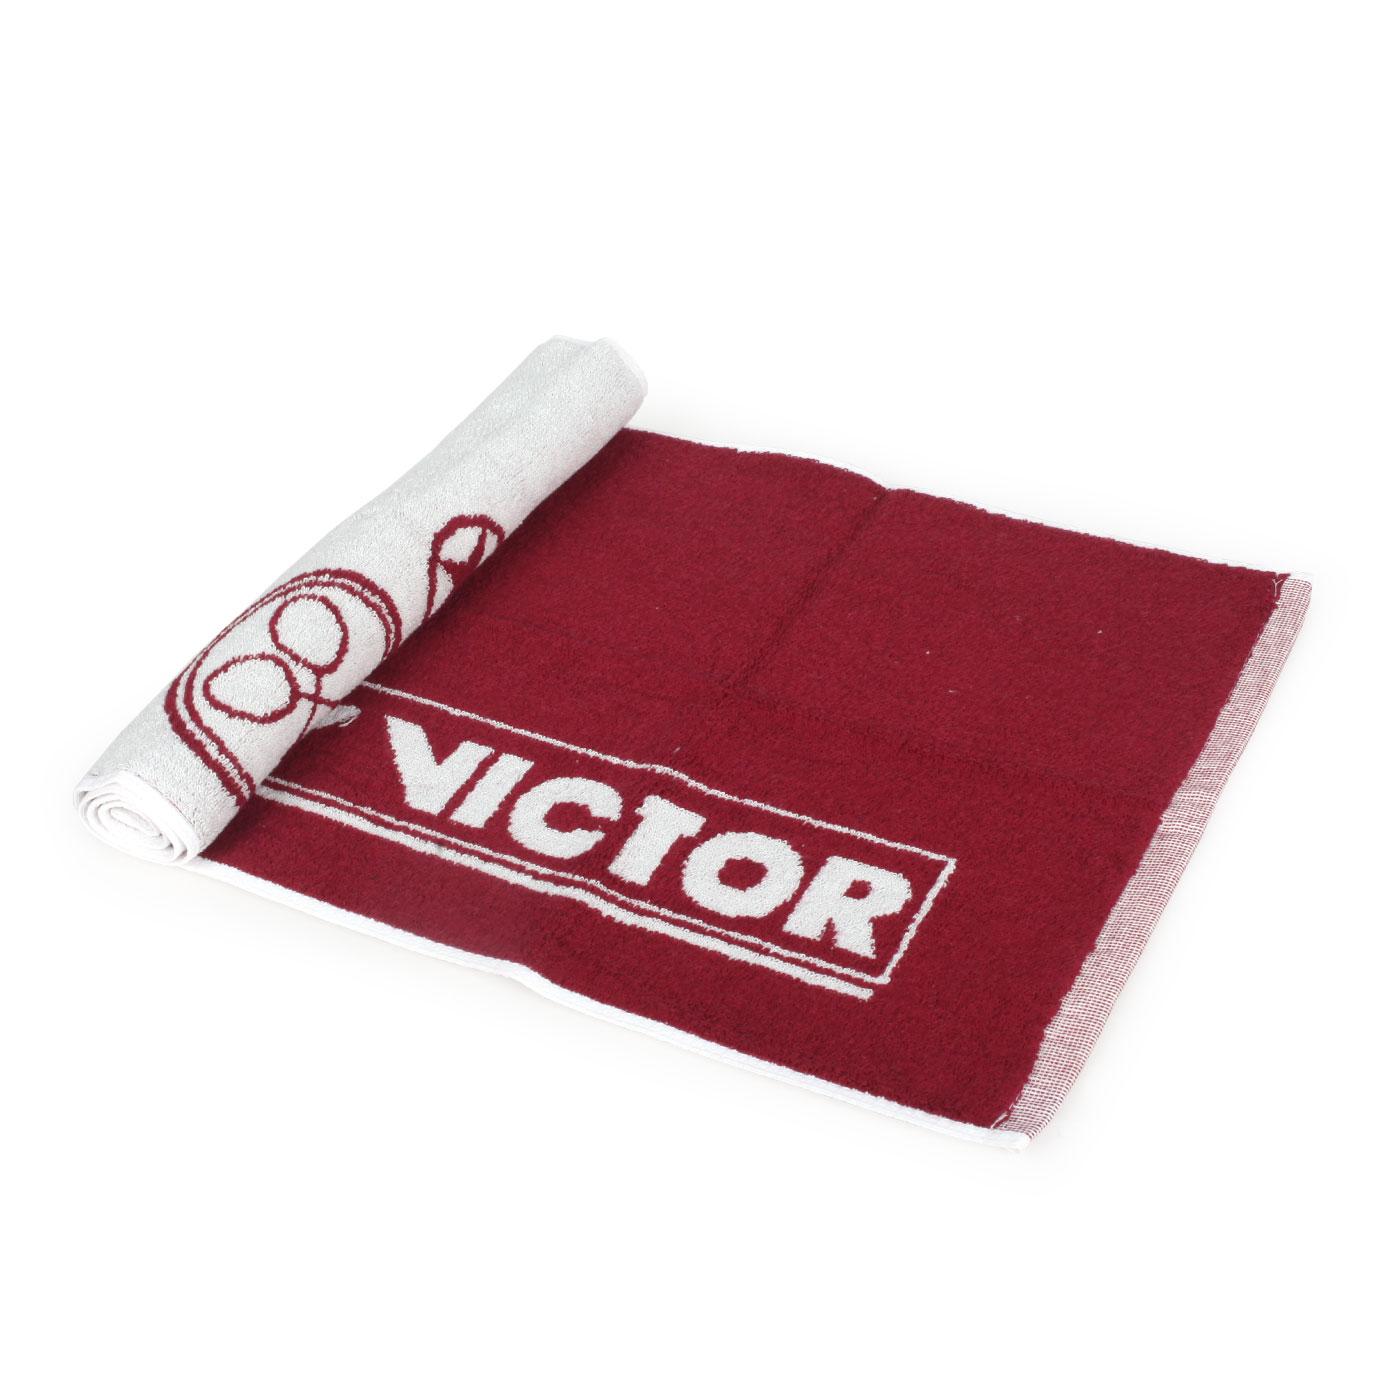 VICTOR 運動毛巾 C-4159D - 酒紅白